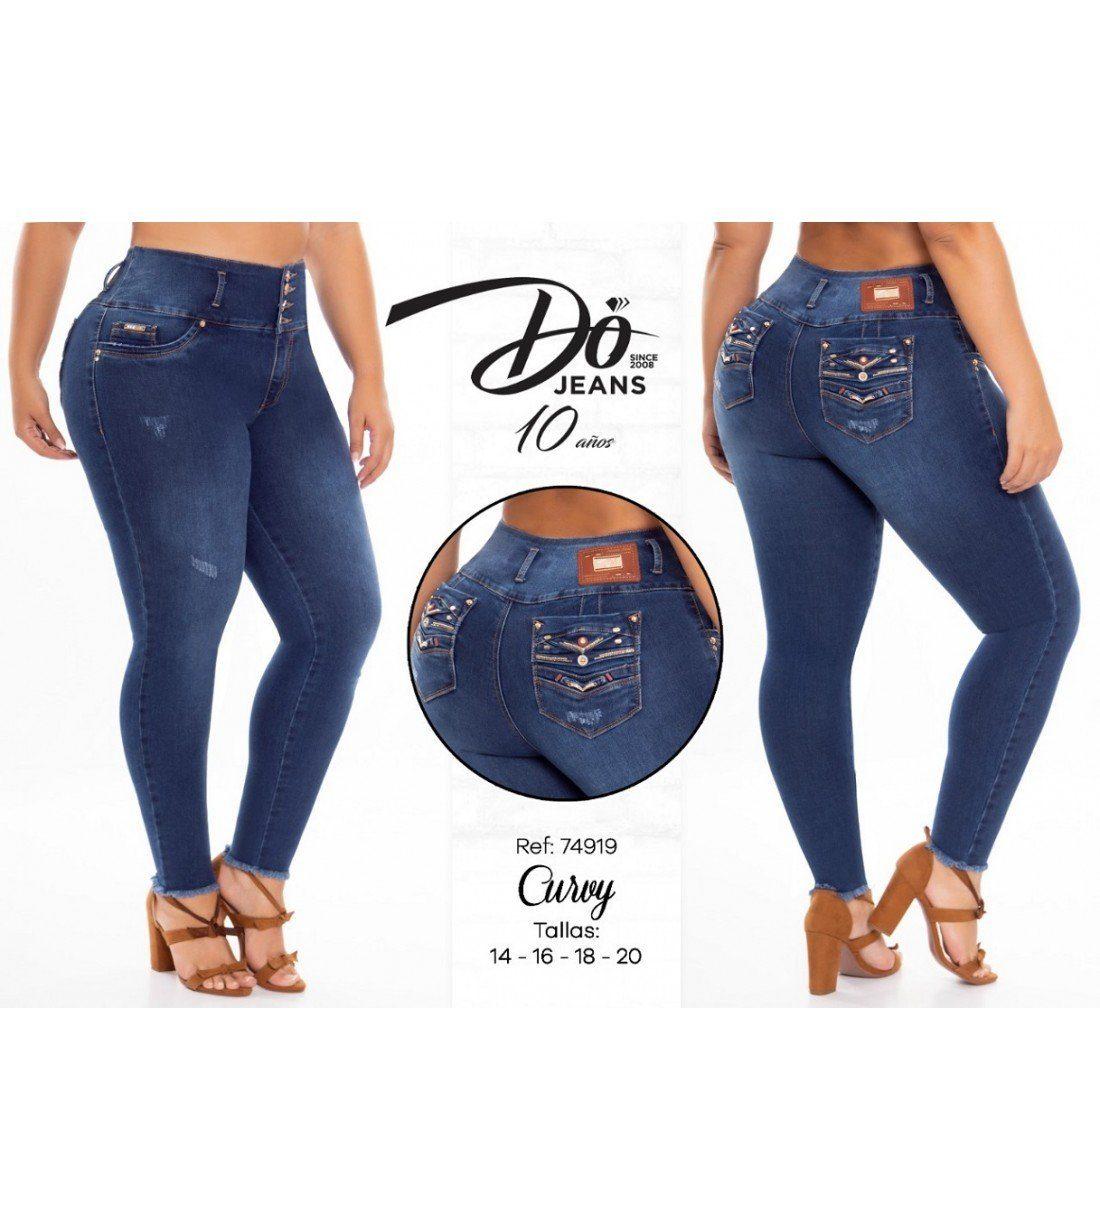 Pantalon Do Jeans Levanta cola 74919